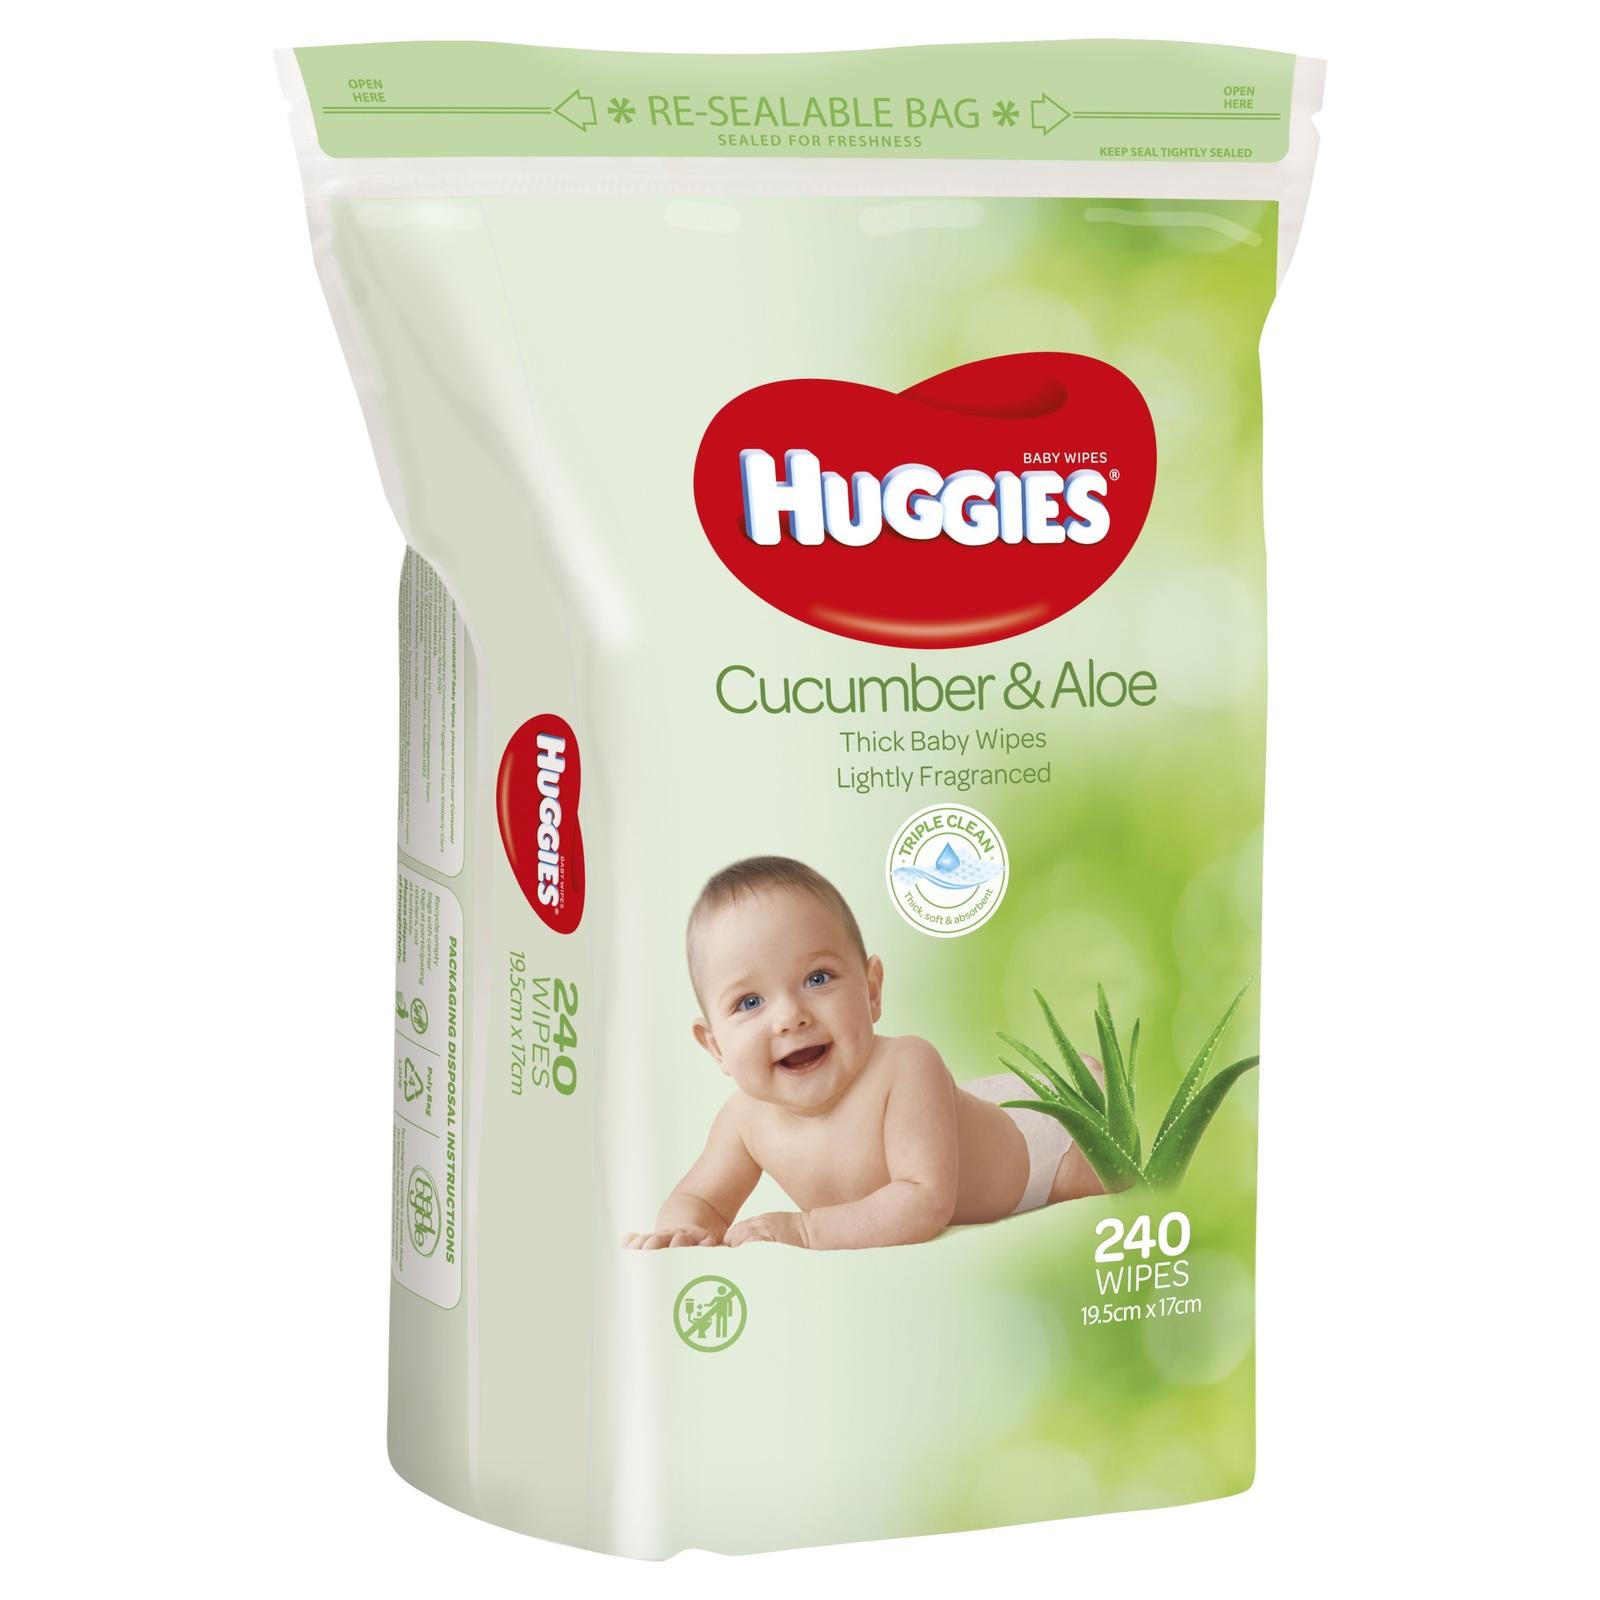 Huggies Baby Wipes - Cucumber & Aloe Jumbo Pack (240 Wipes) image